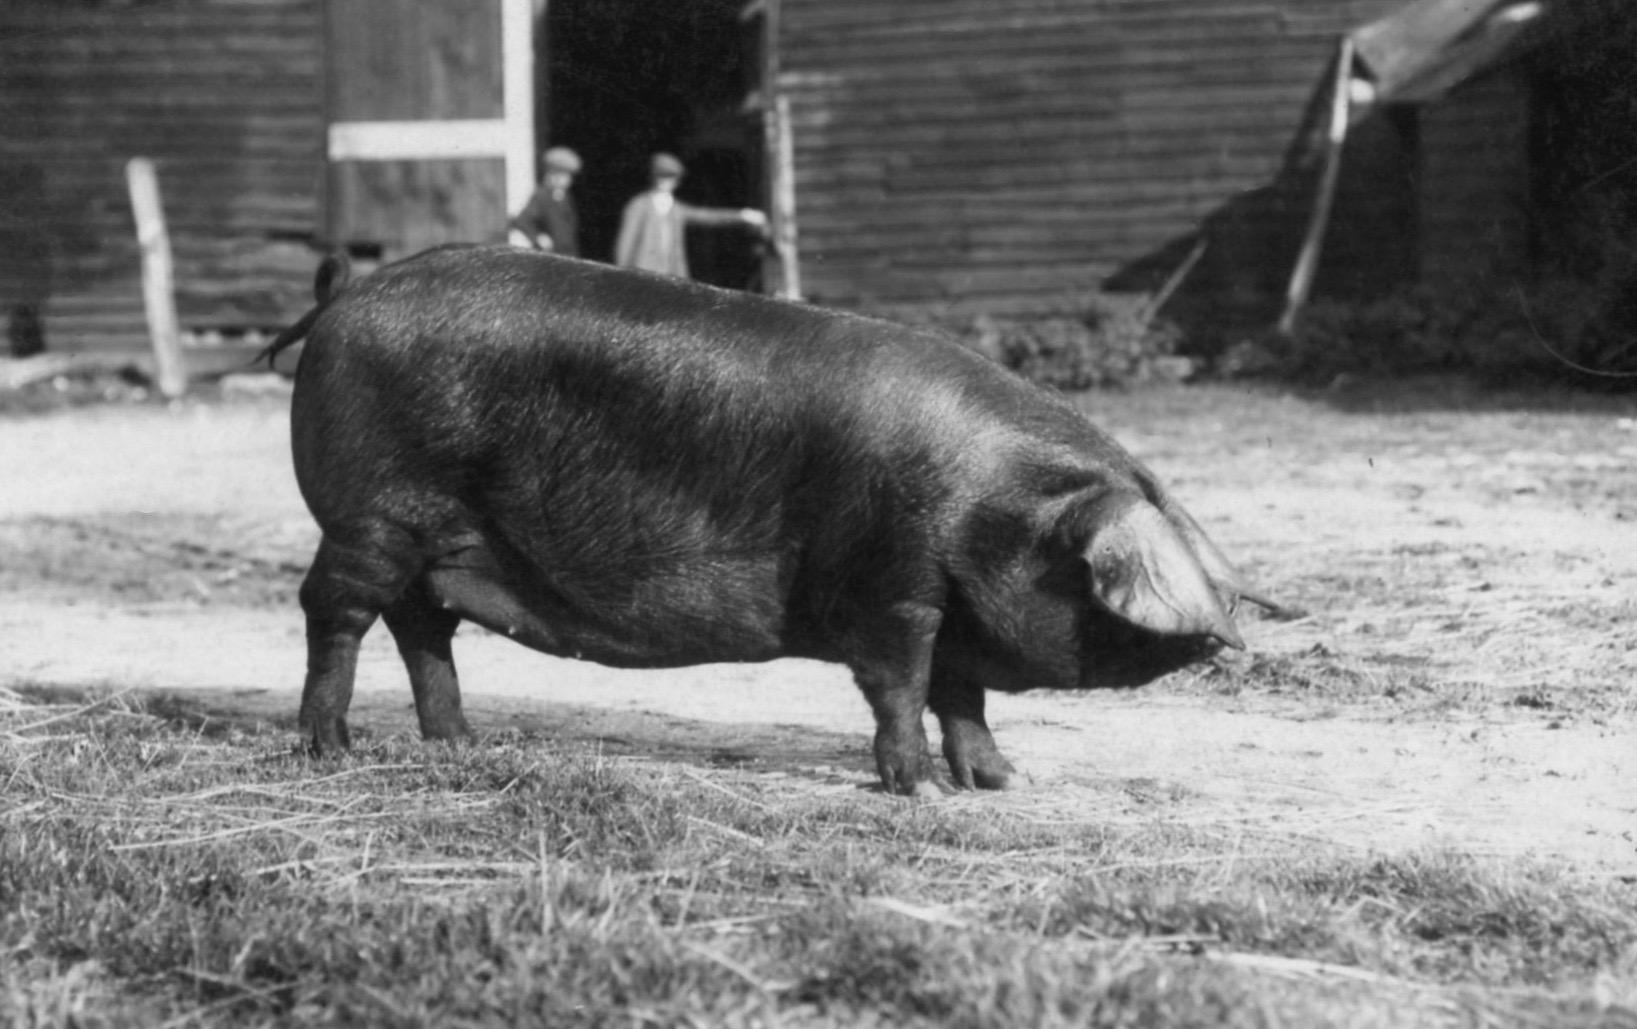 Large Black sow